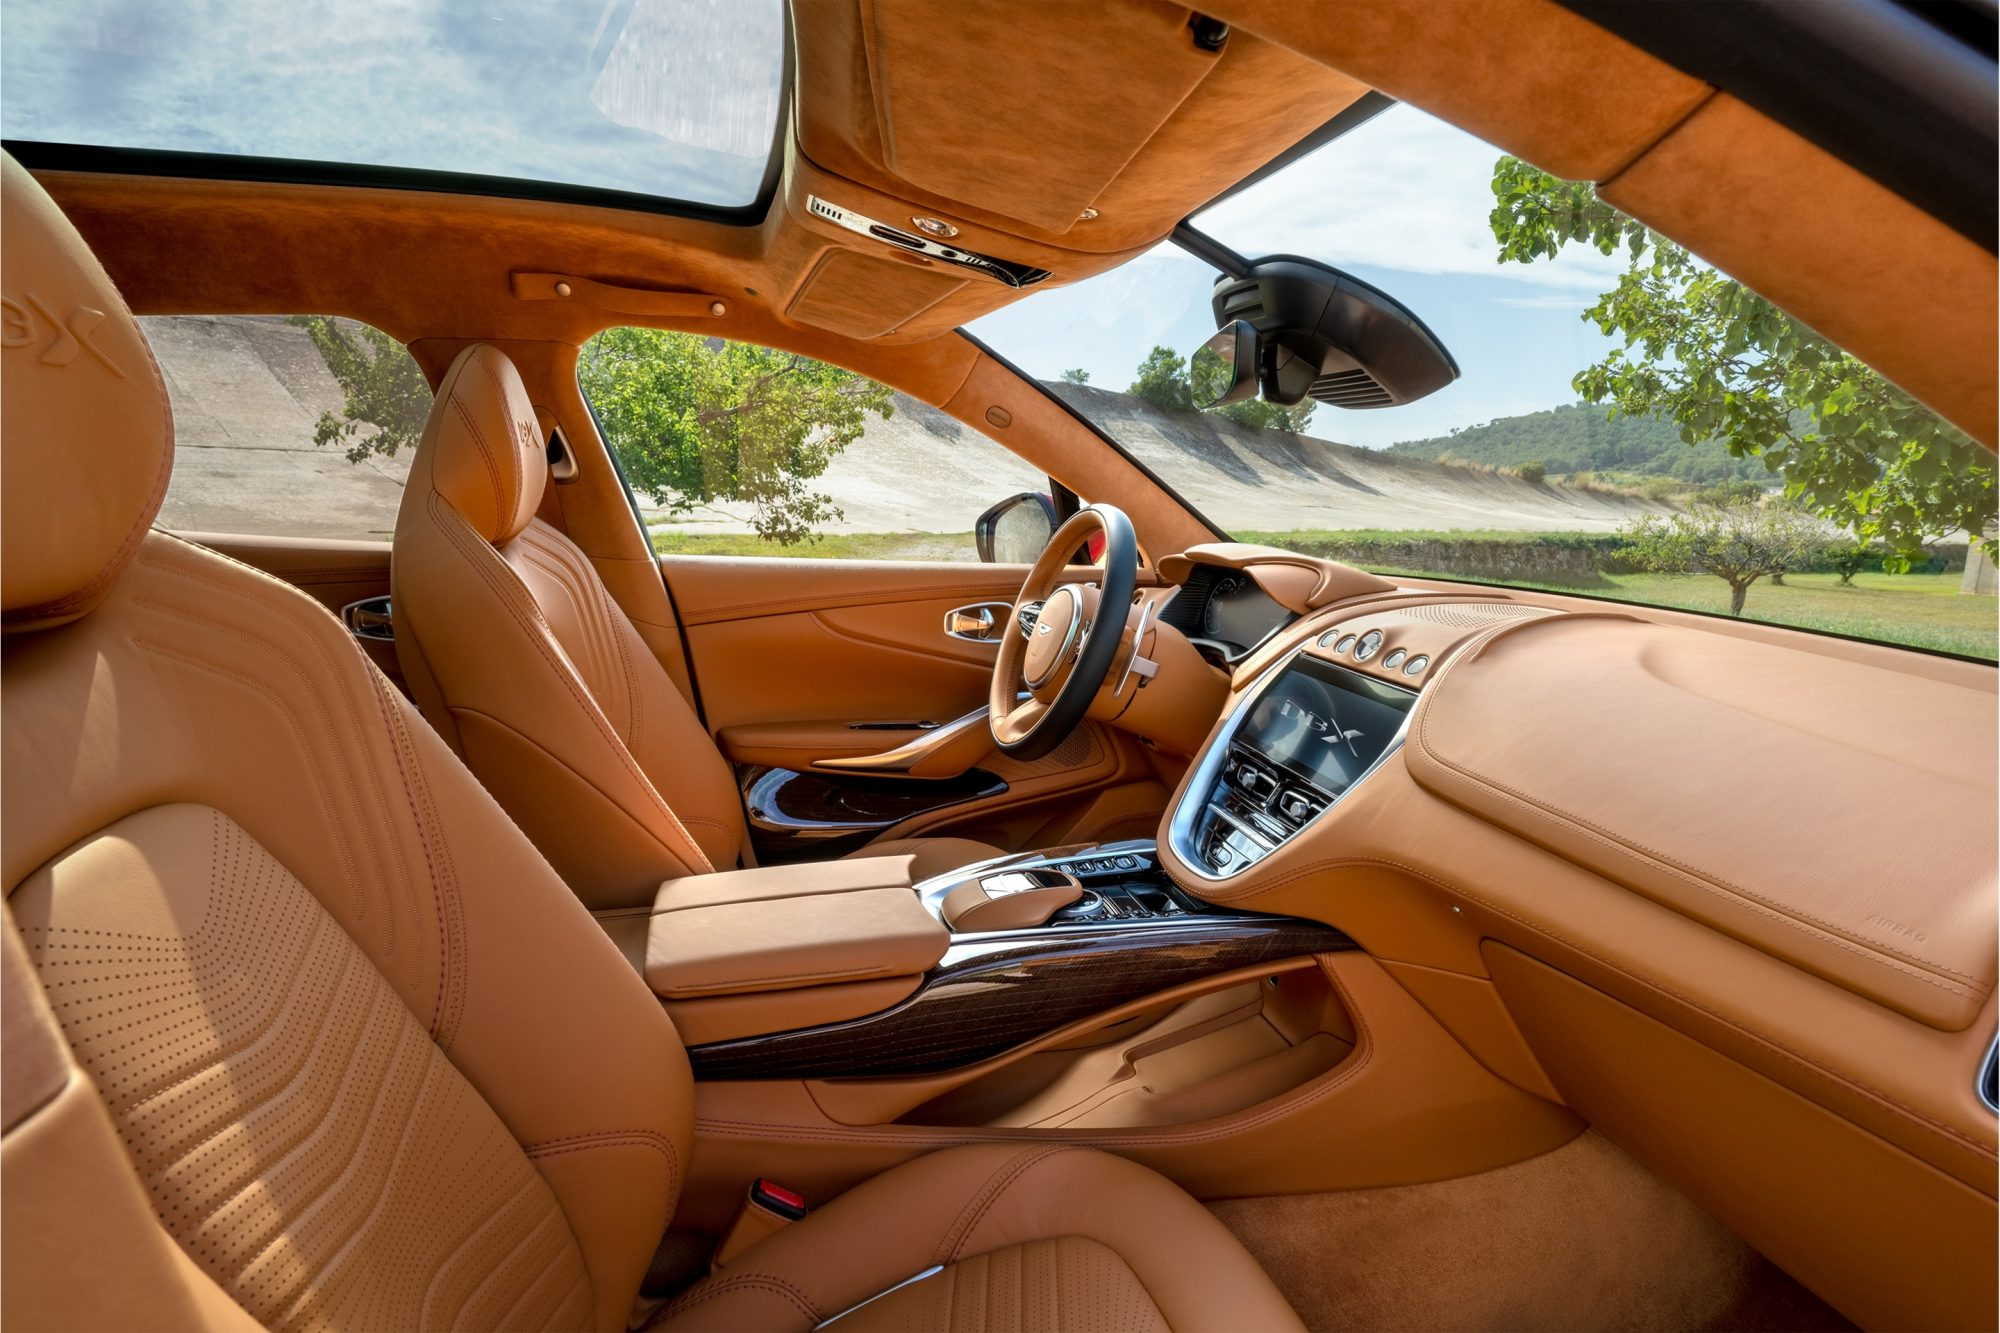 Aston Martin DBX suv - petrolhead corner - 6